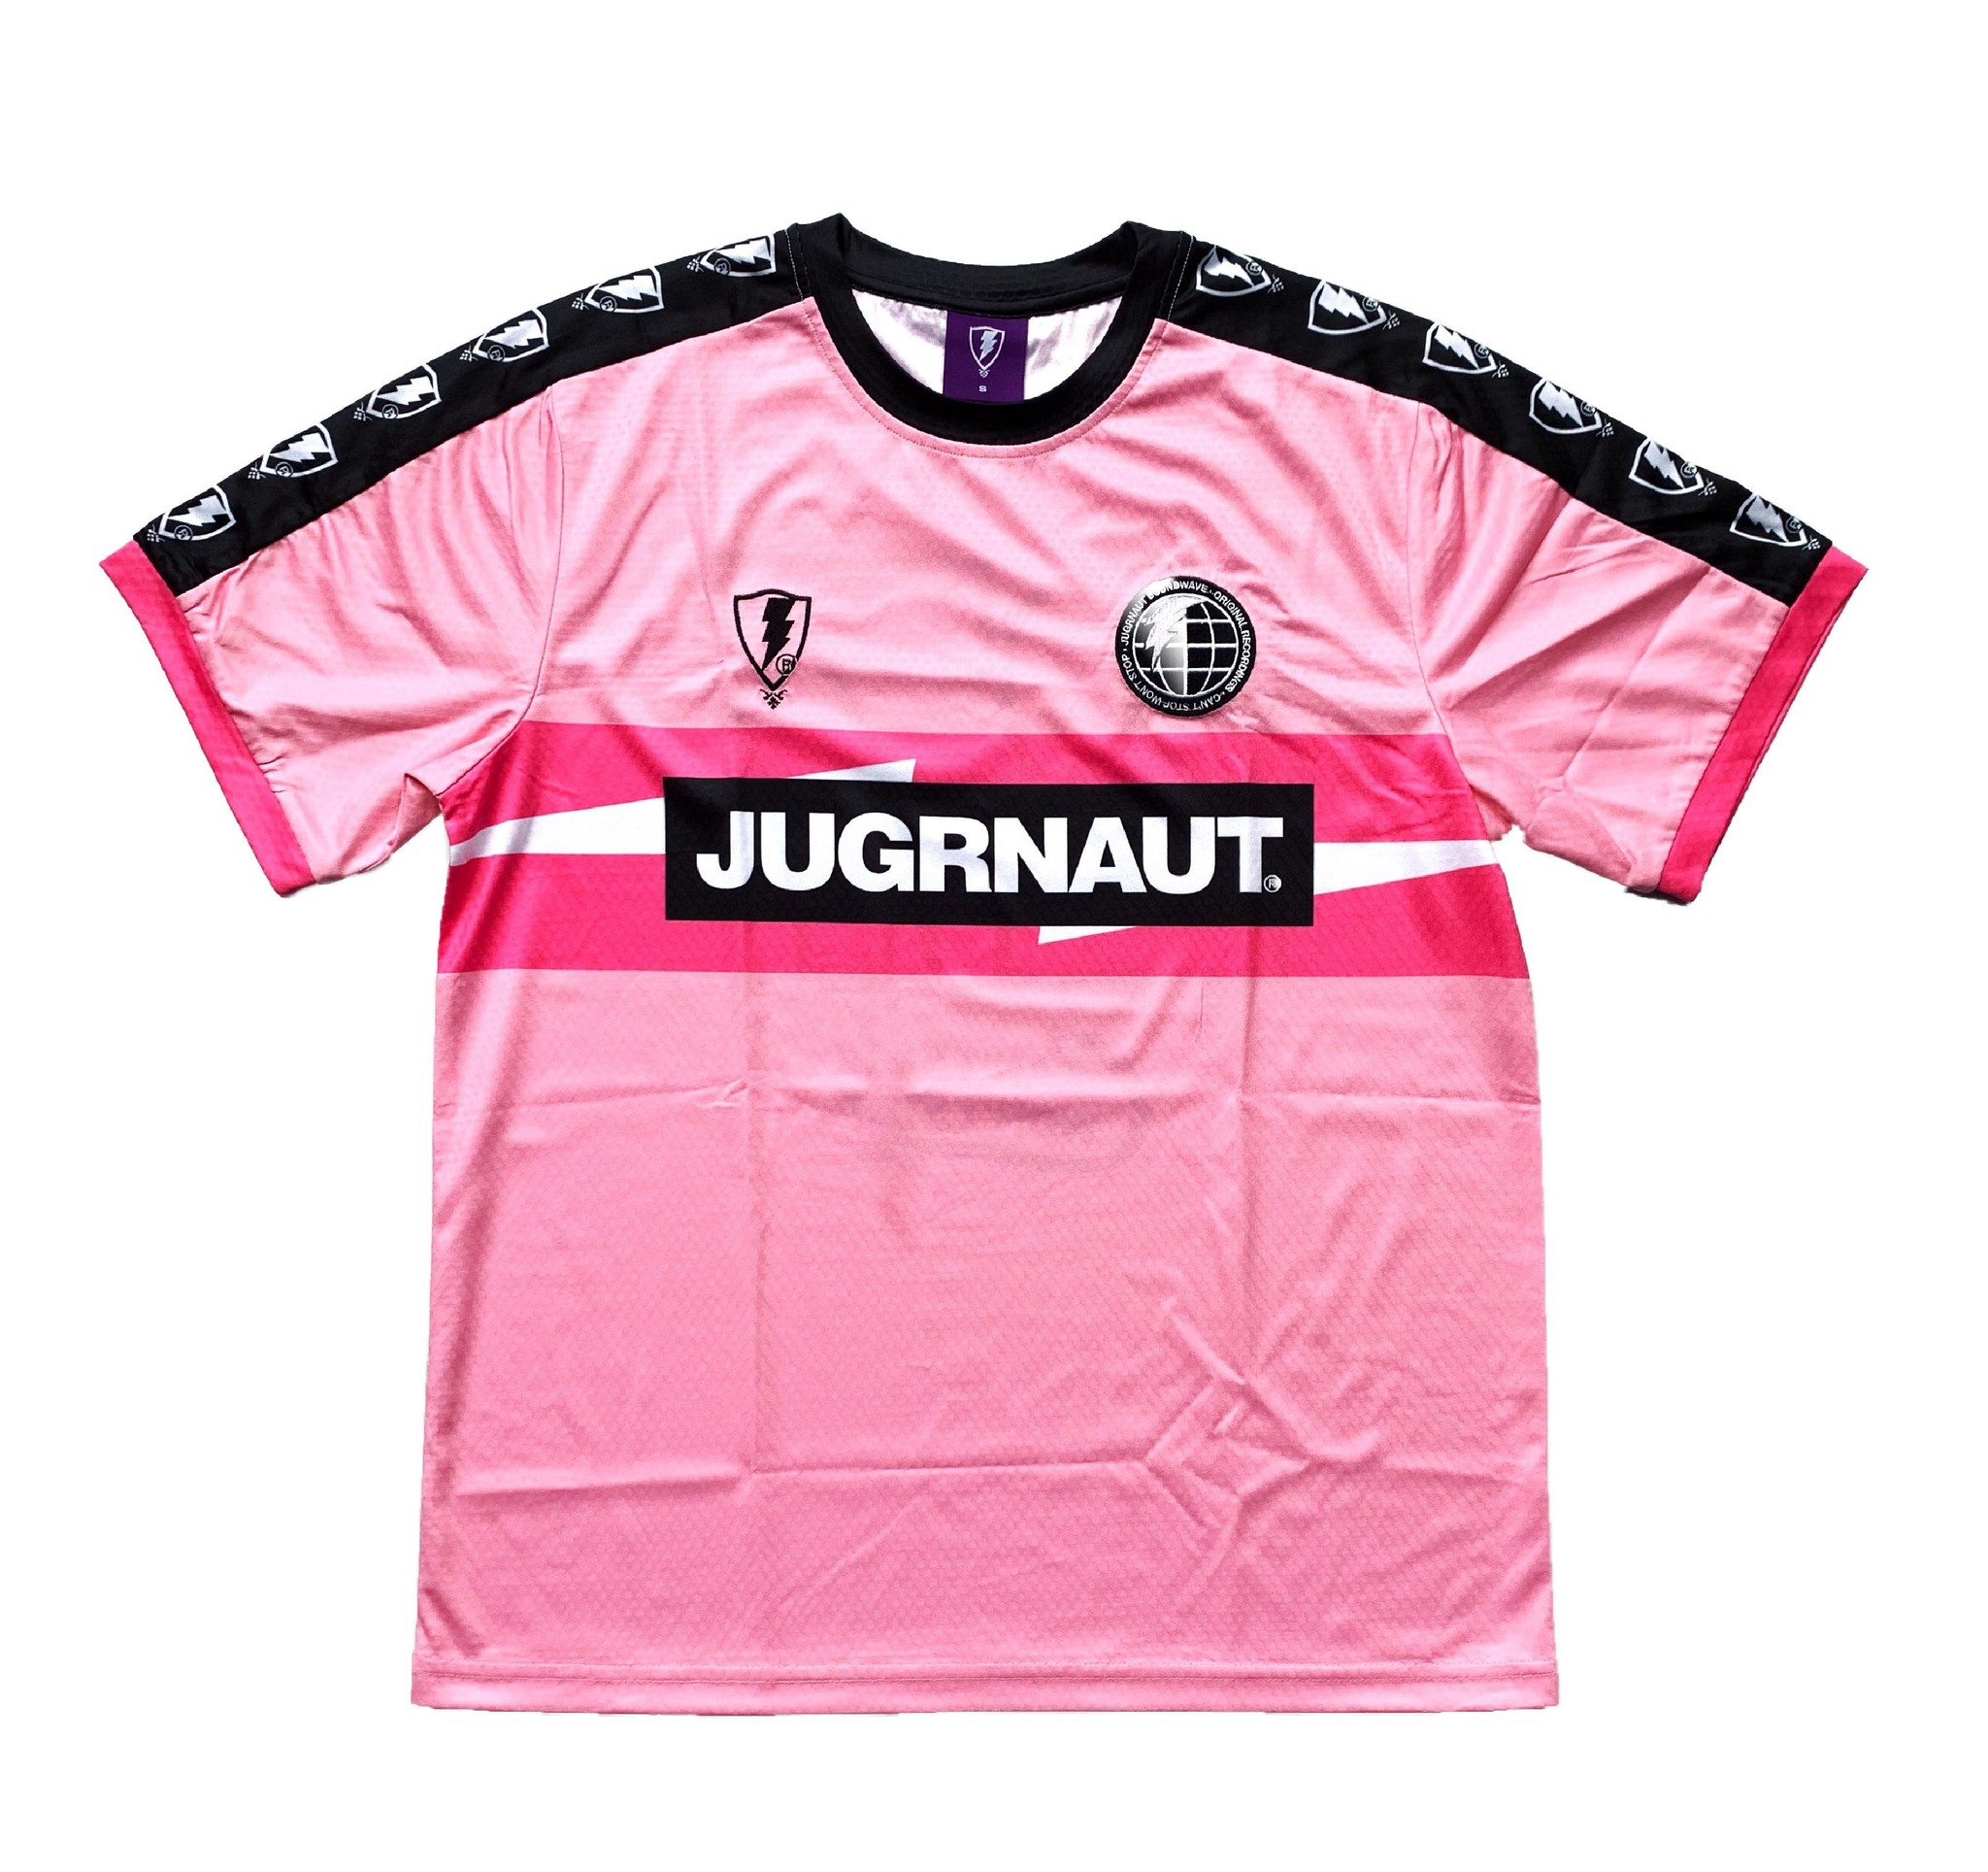 separation shoes 72772 7a0d9 Jugrnaut Juventus Pink Soccer Jersey